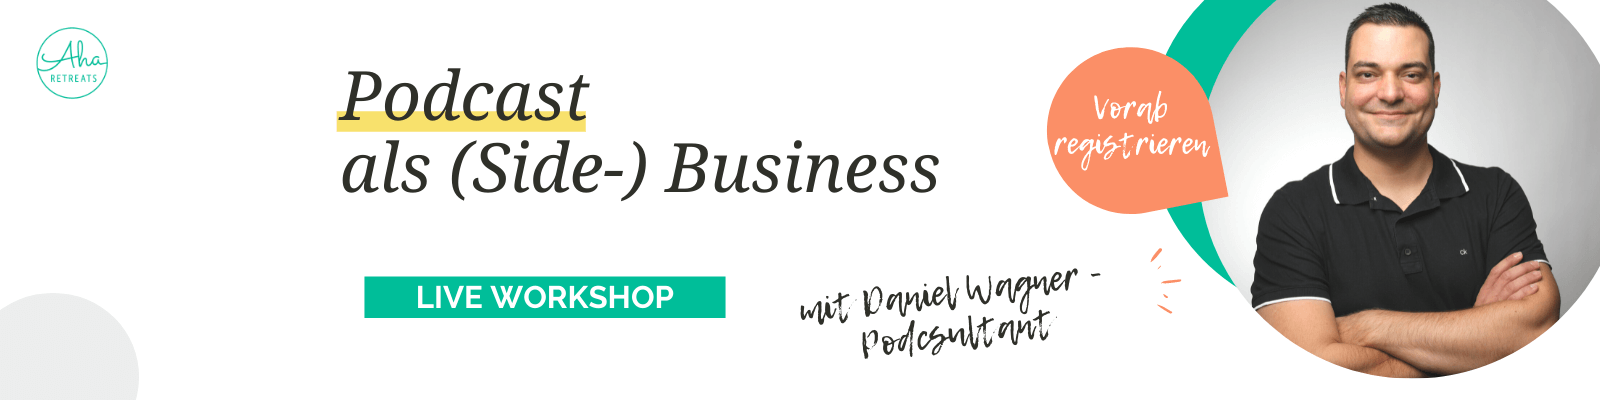 Podcast als (Side-) Business starten